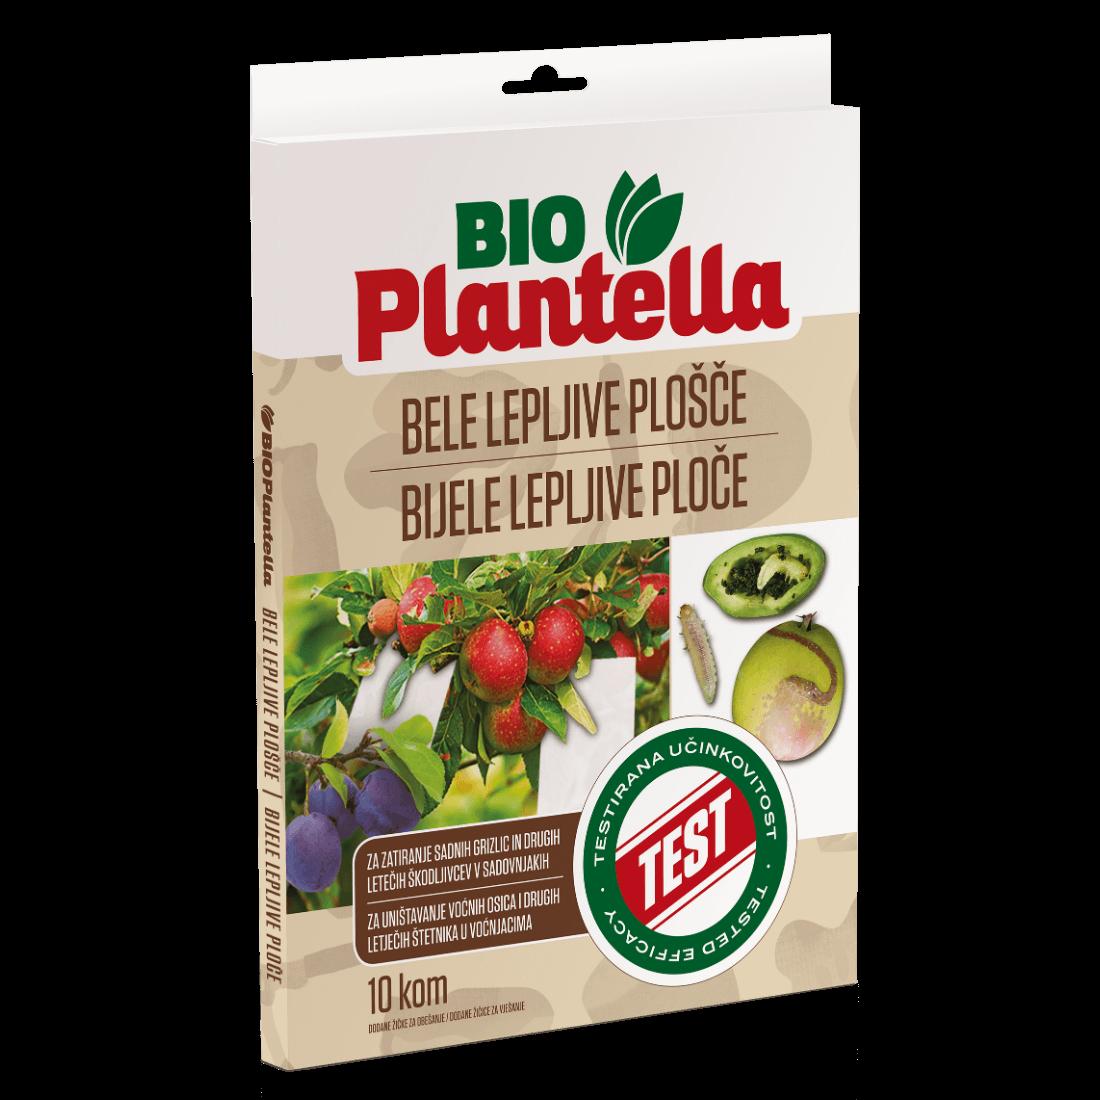 Bio-Plantella_Bele-lepljive-plosce_10kom_SI-HR